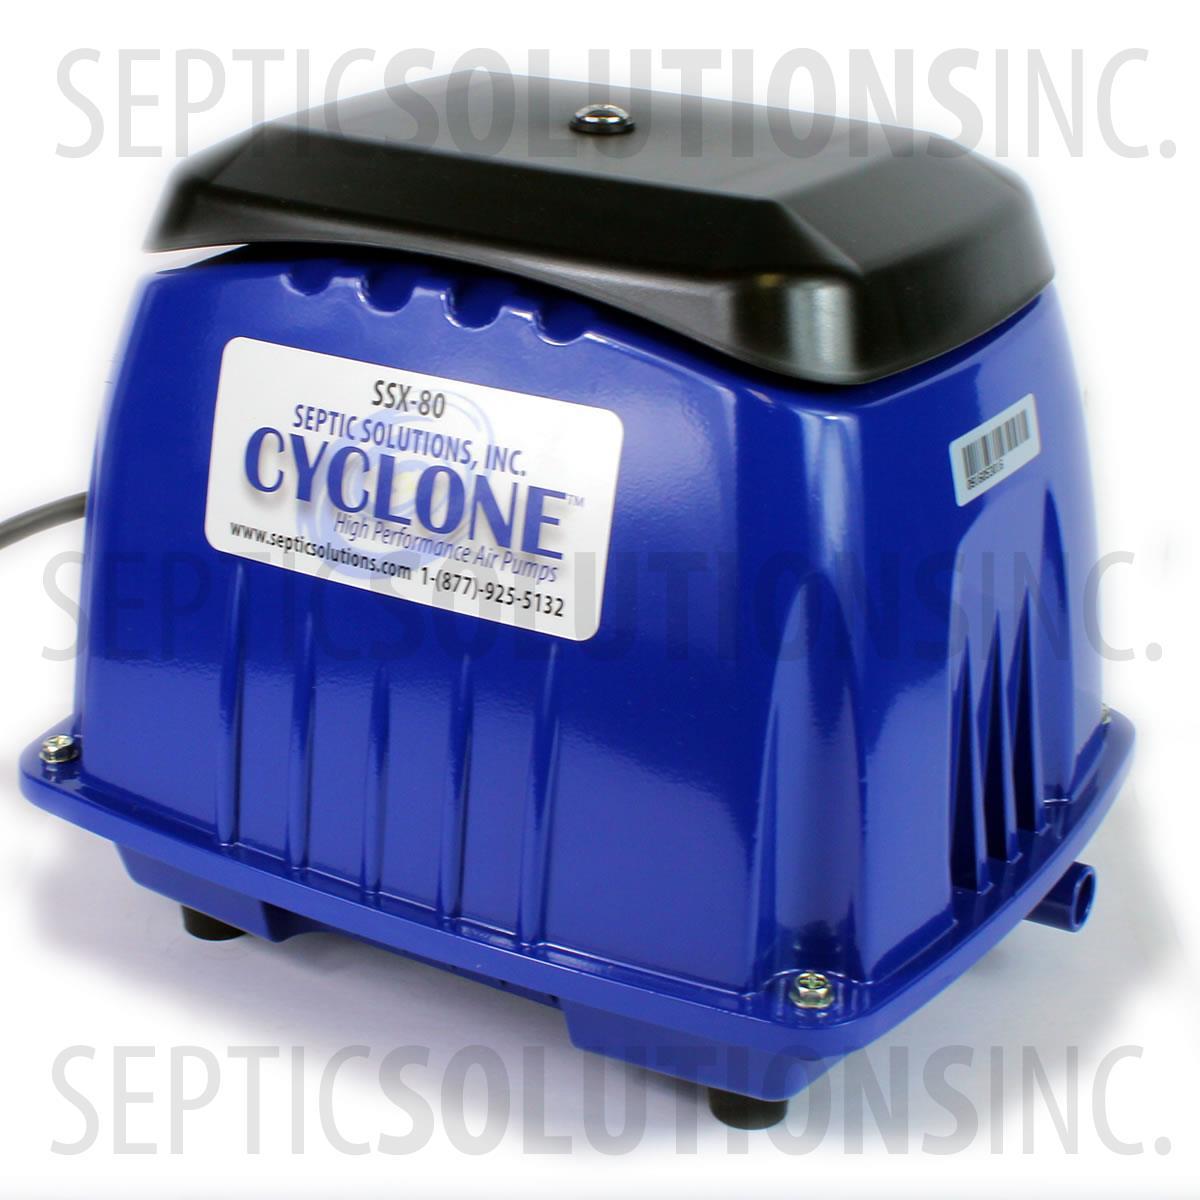 Cyclone Ssx 80 Septic Air Pump Ssx80 Free Shipping